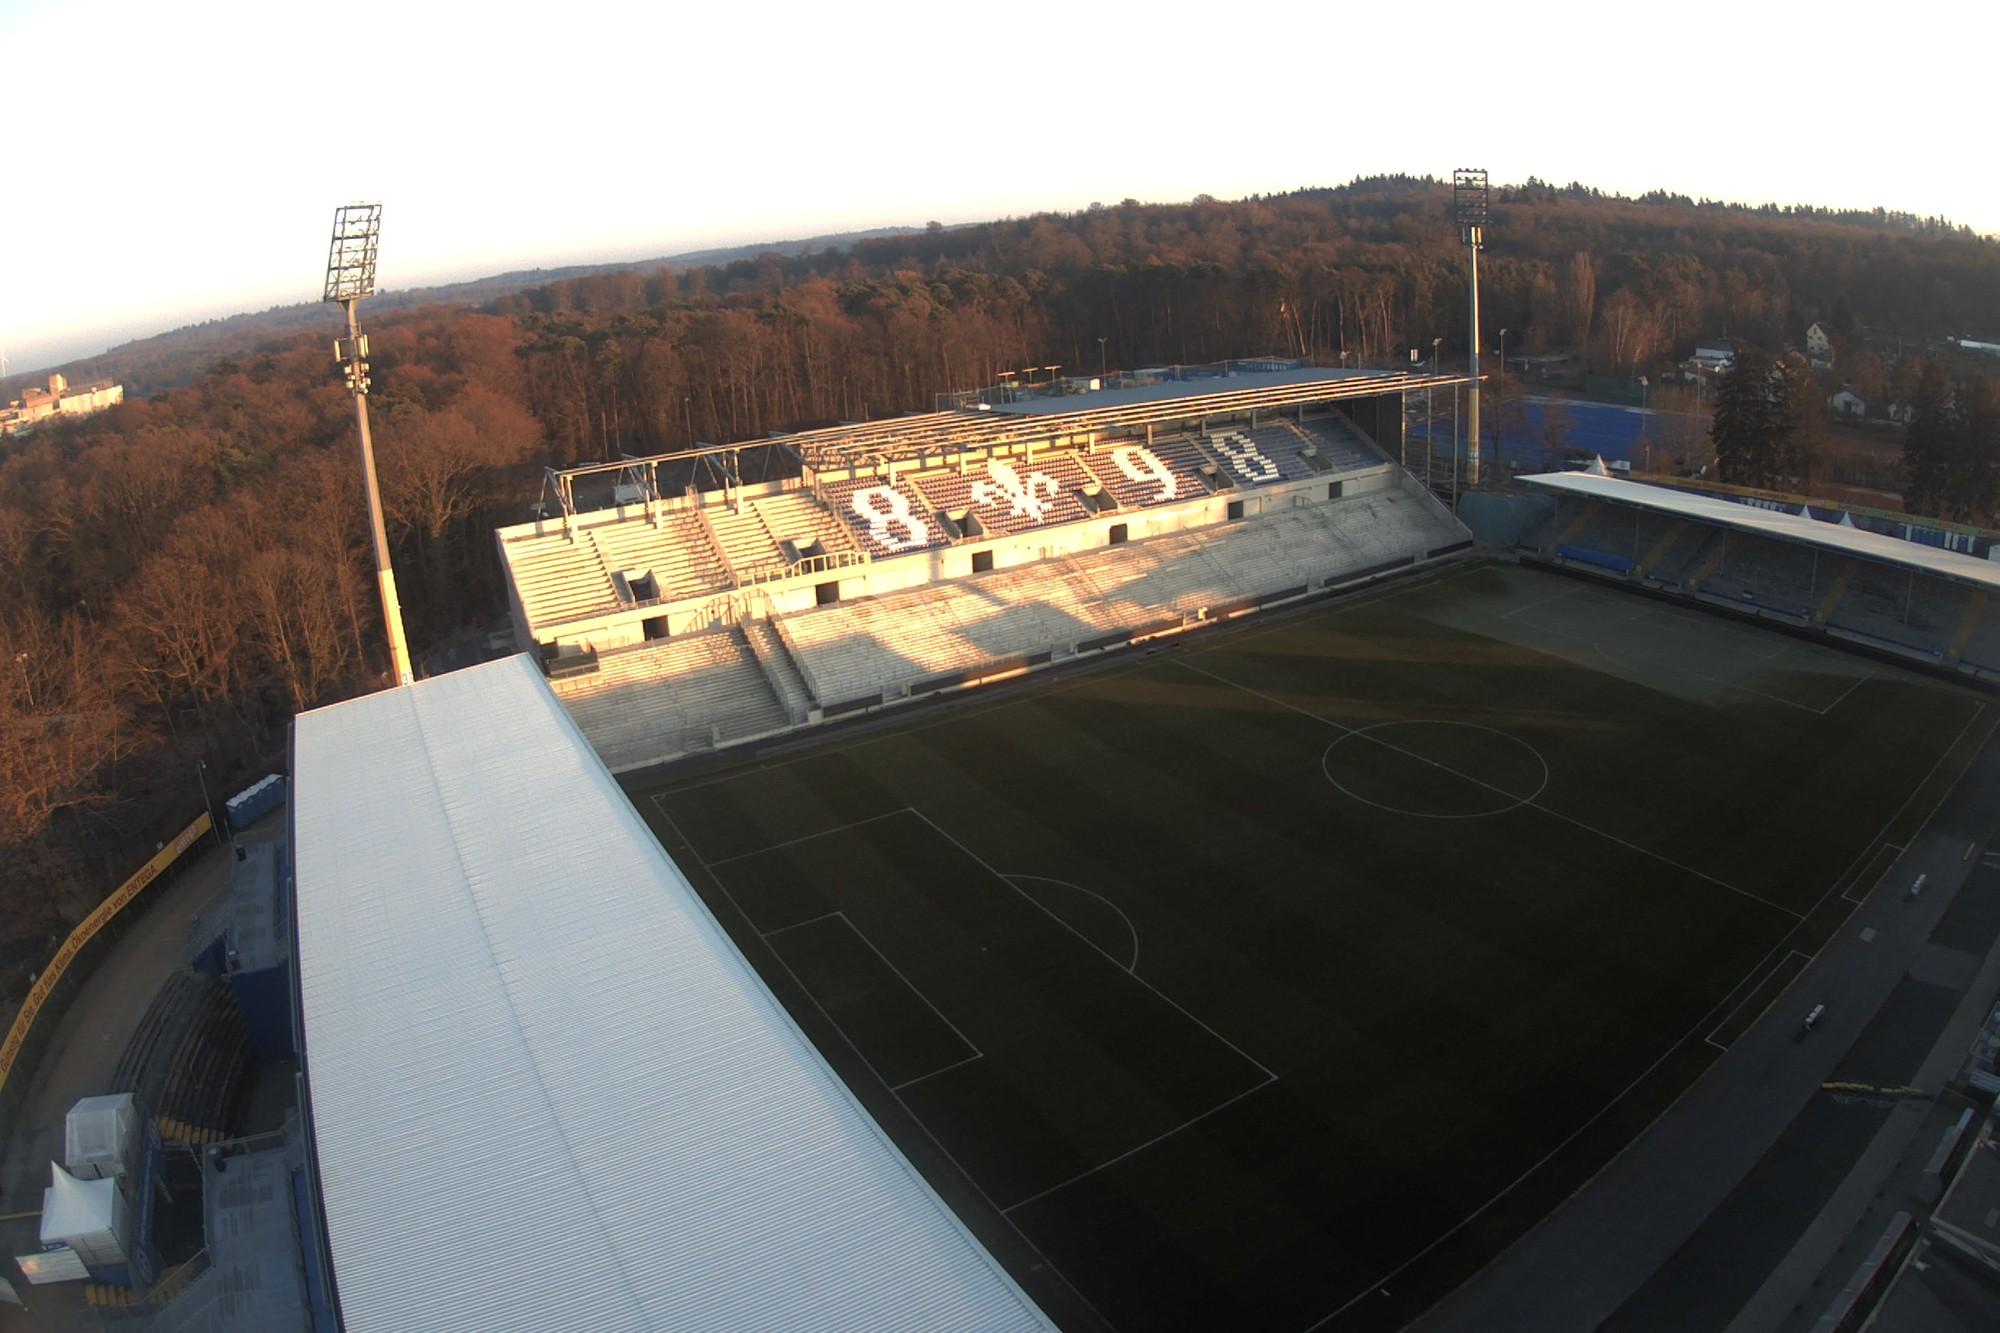 Stadion am Boellenfalltor